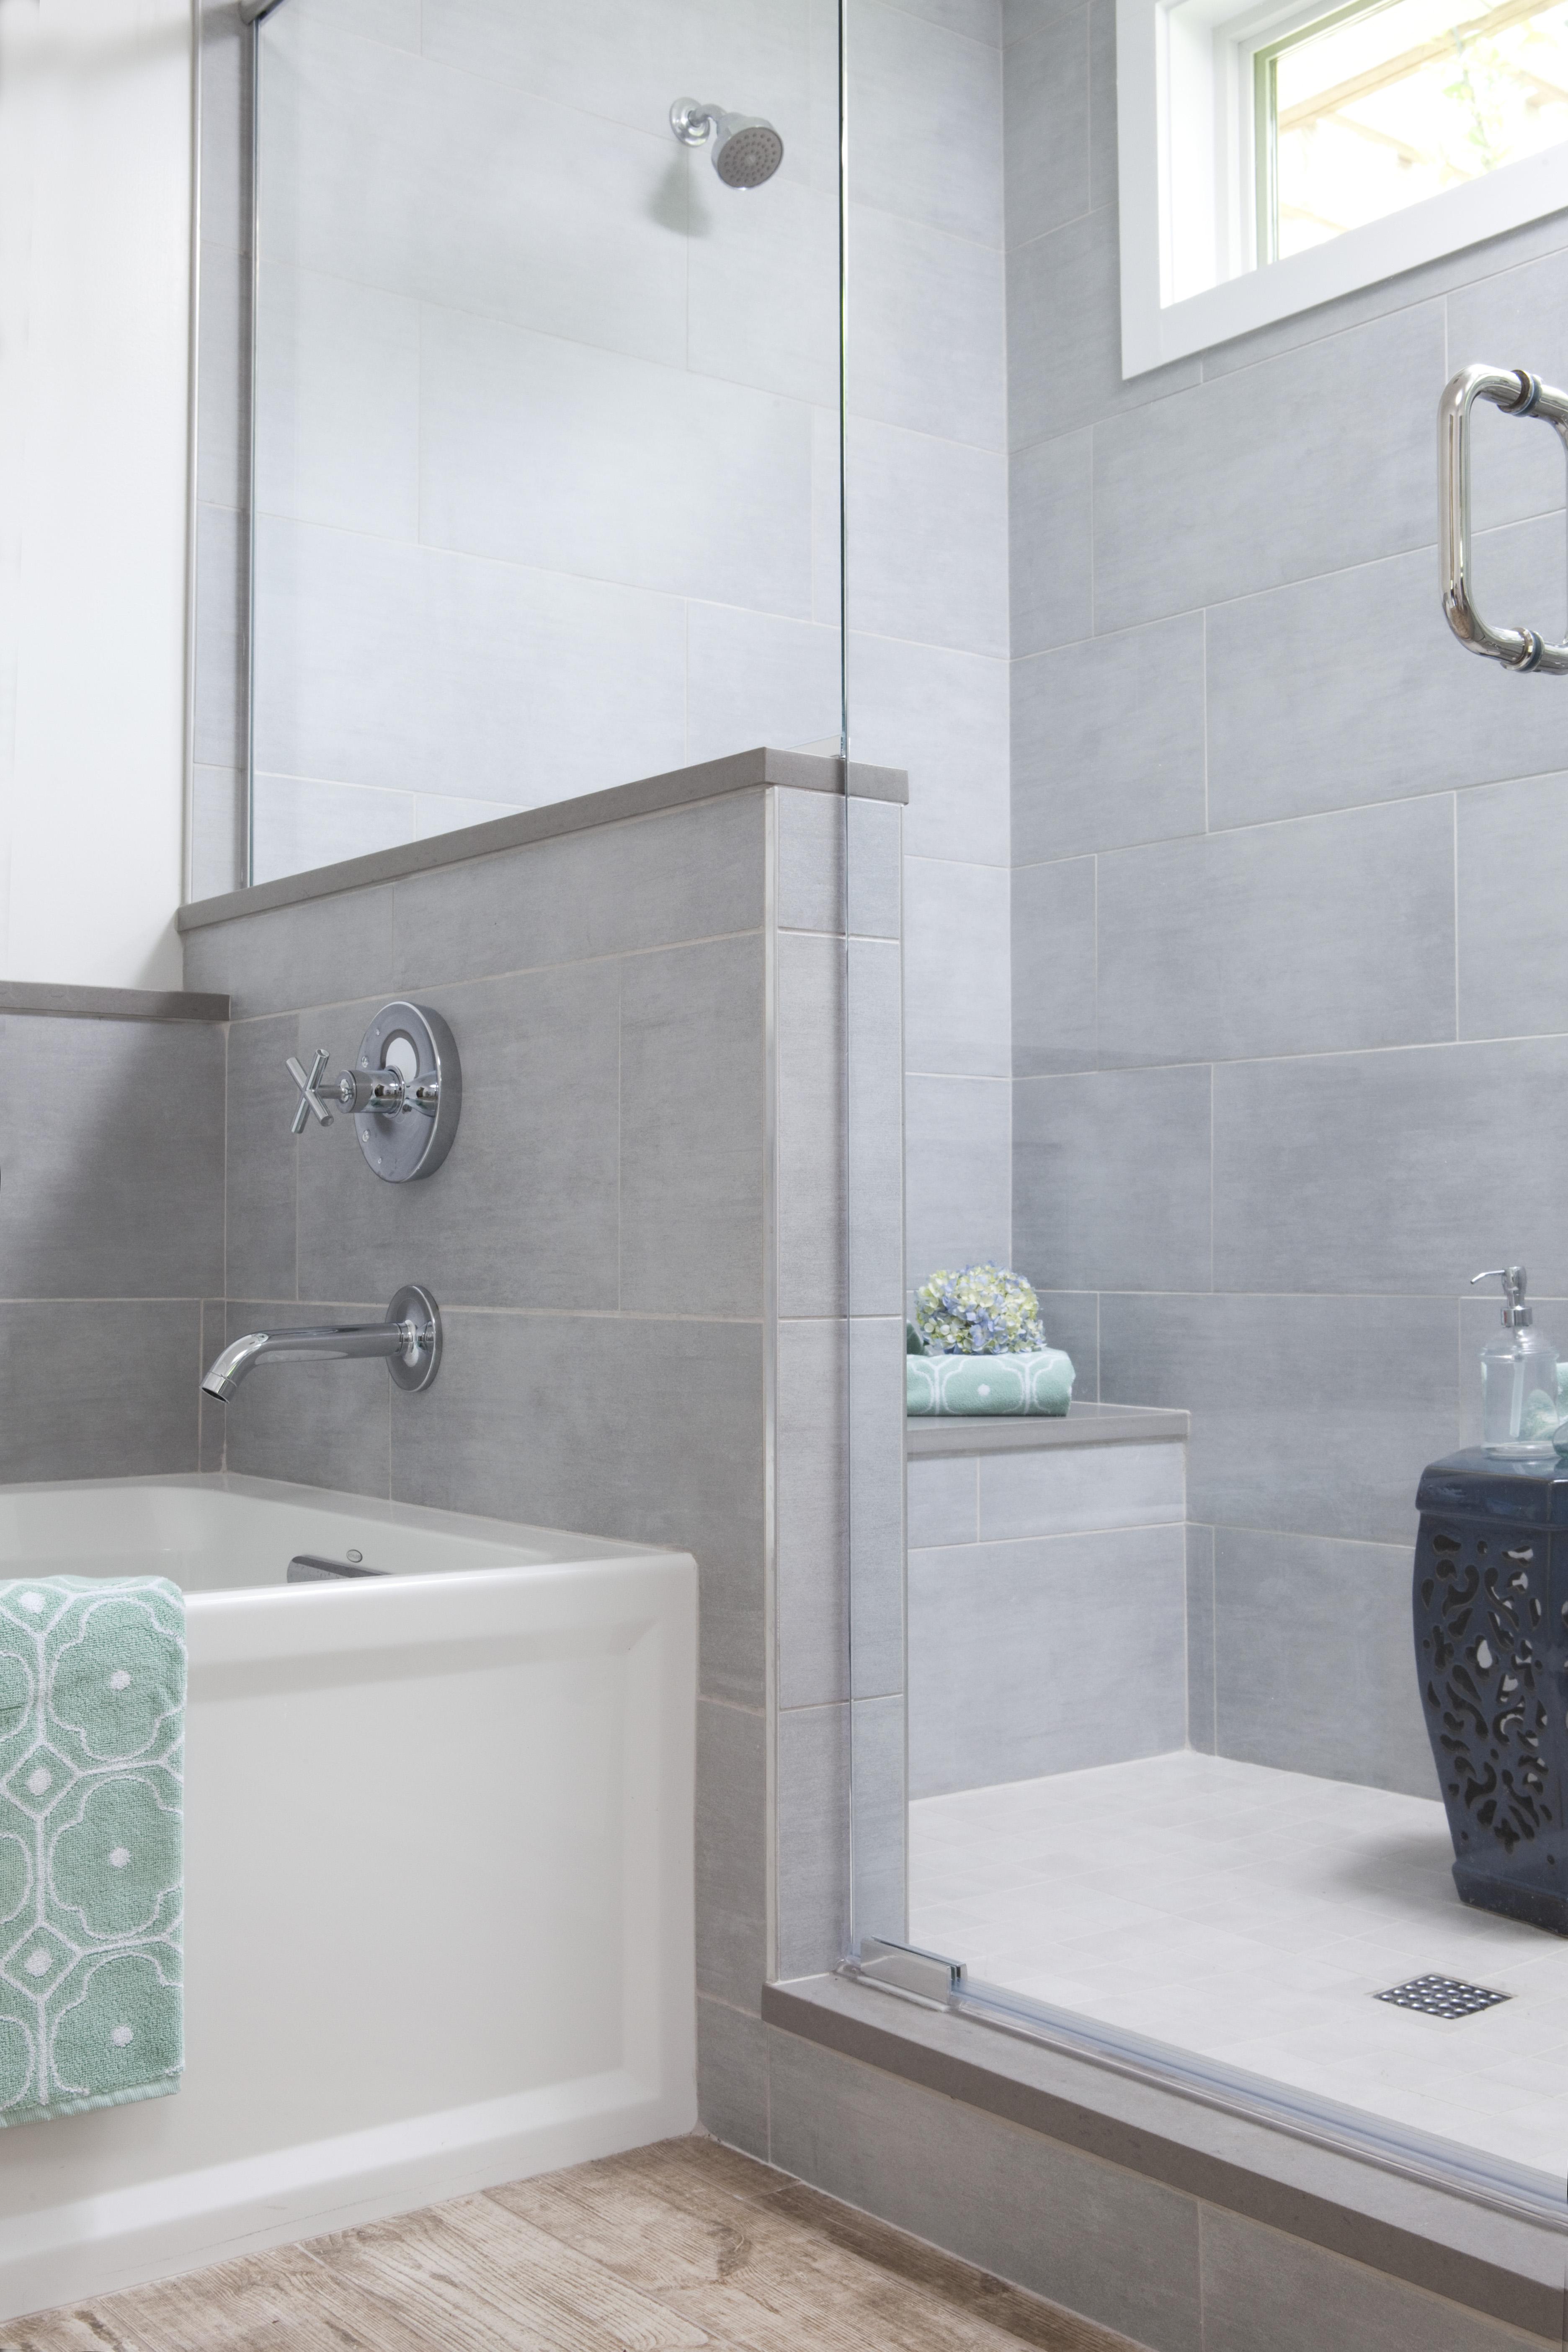 Coastal Atmosphere Inspires Master Bath Remodel Remodeling